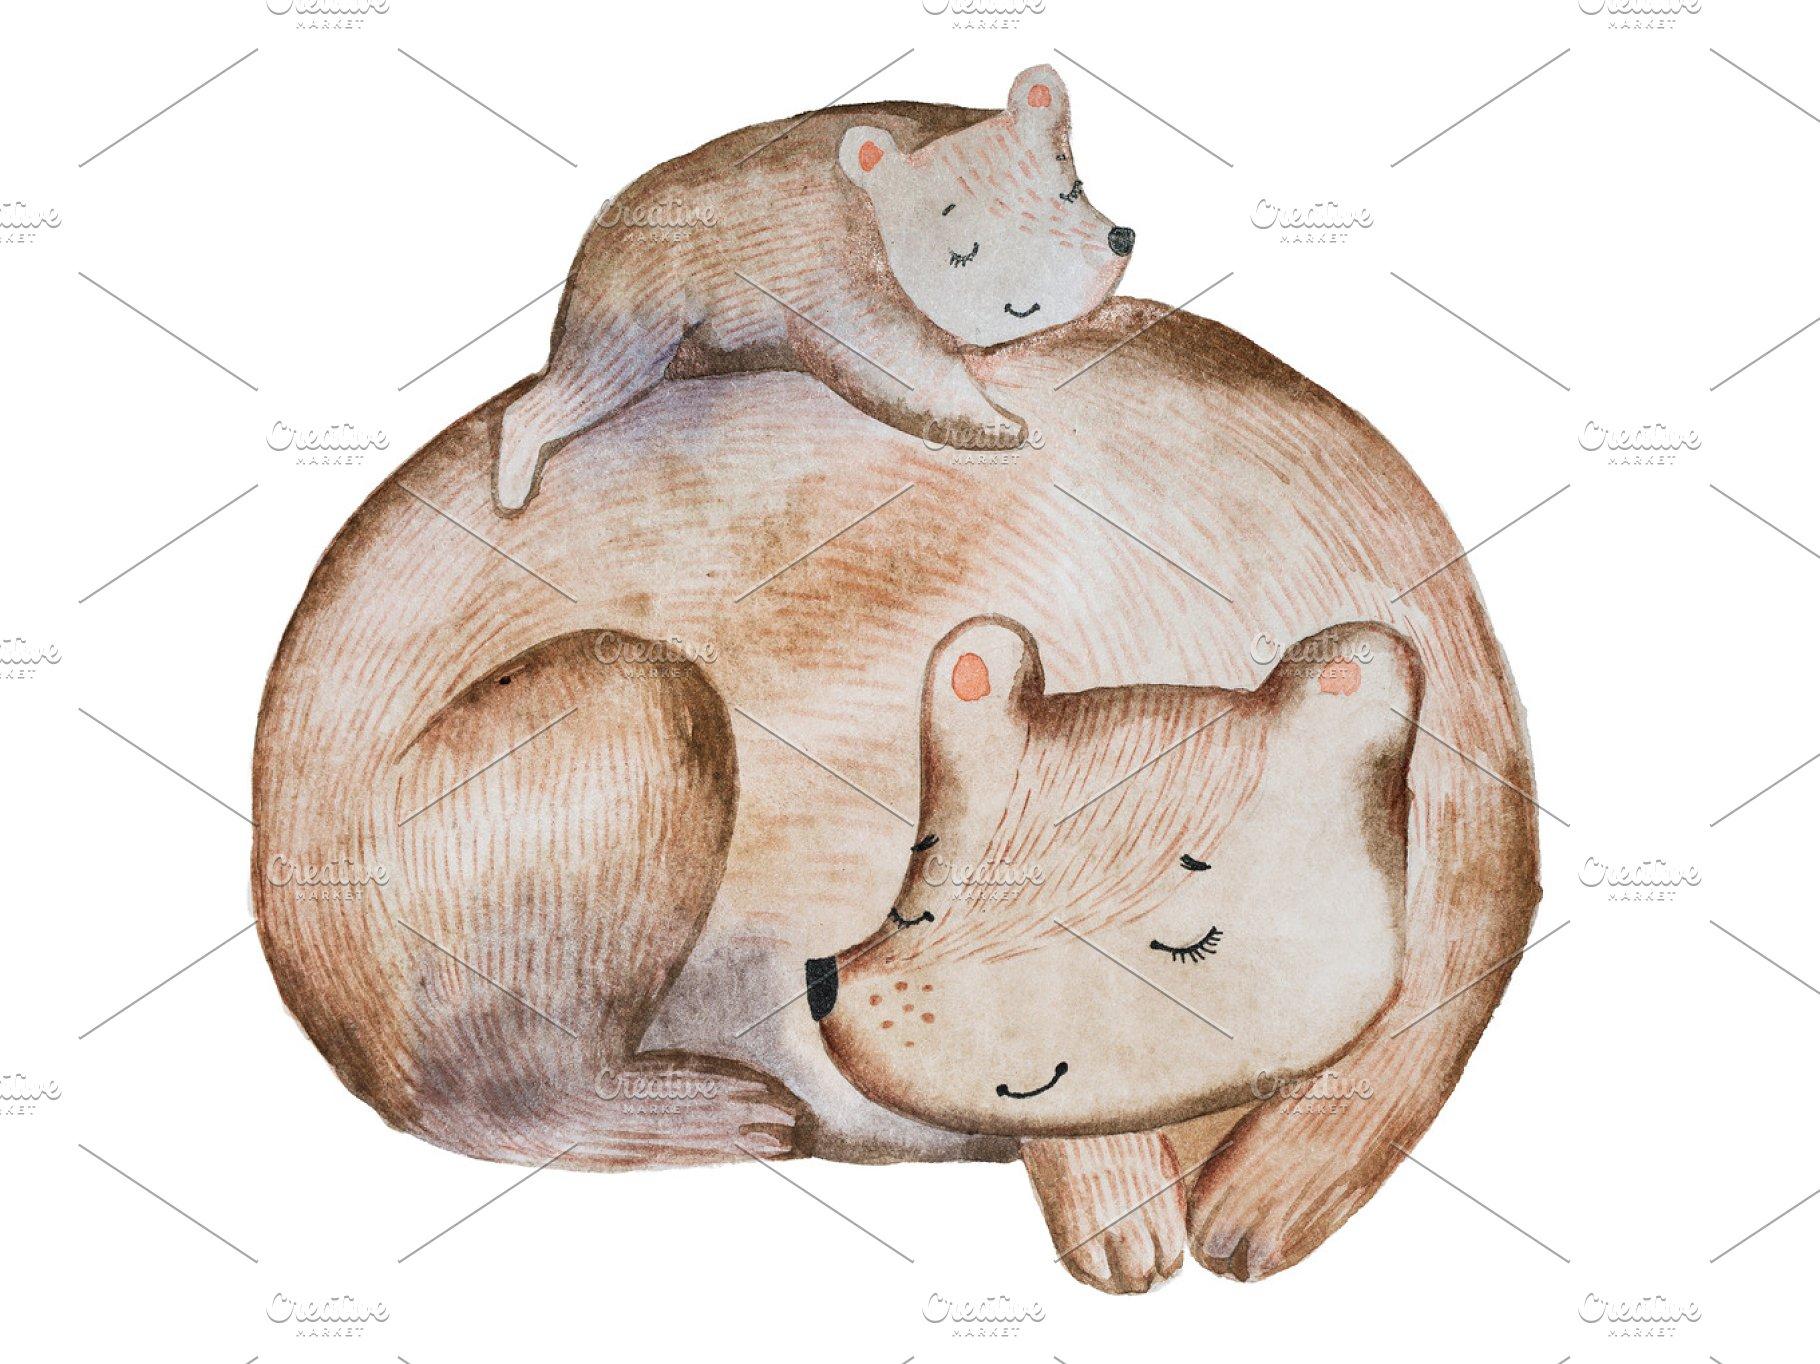 fe8edd0e863 Cute cartoon brown bear and little cub laying on its back sleeping ...